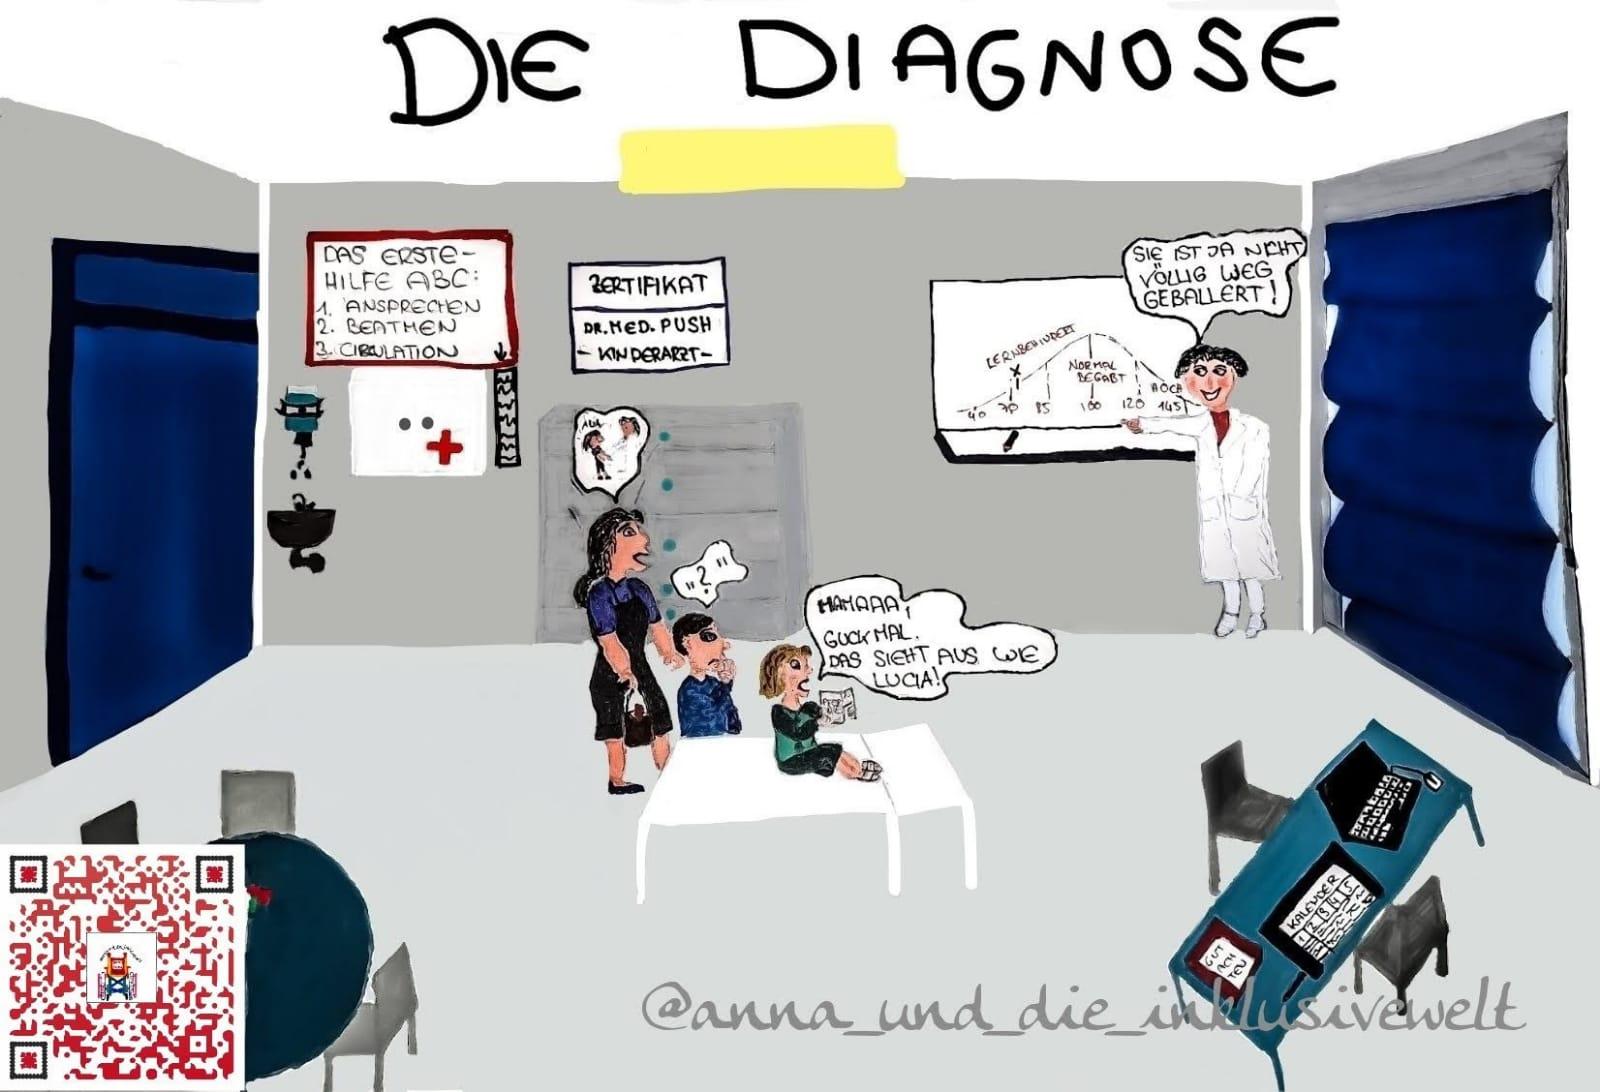 Diediagnose